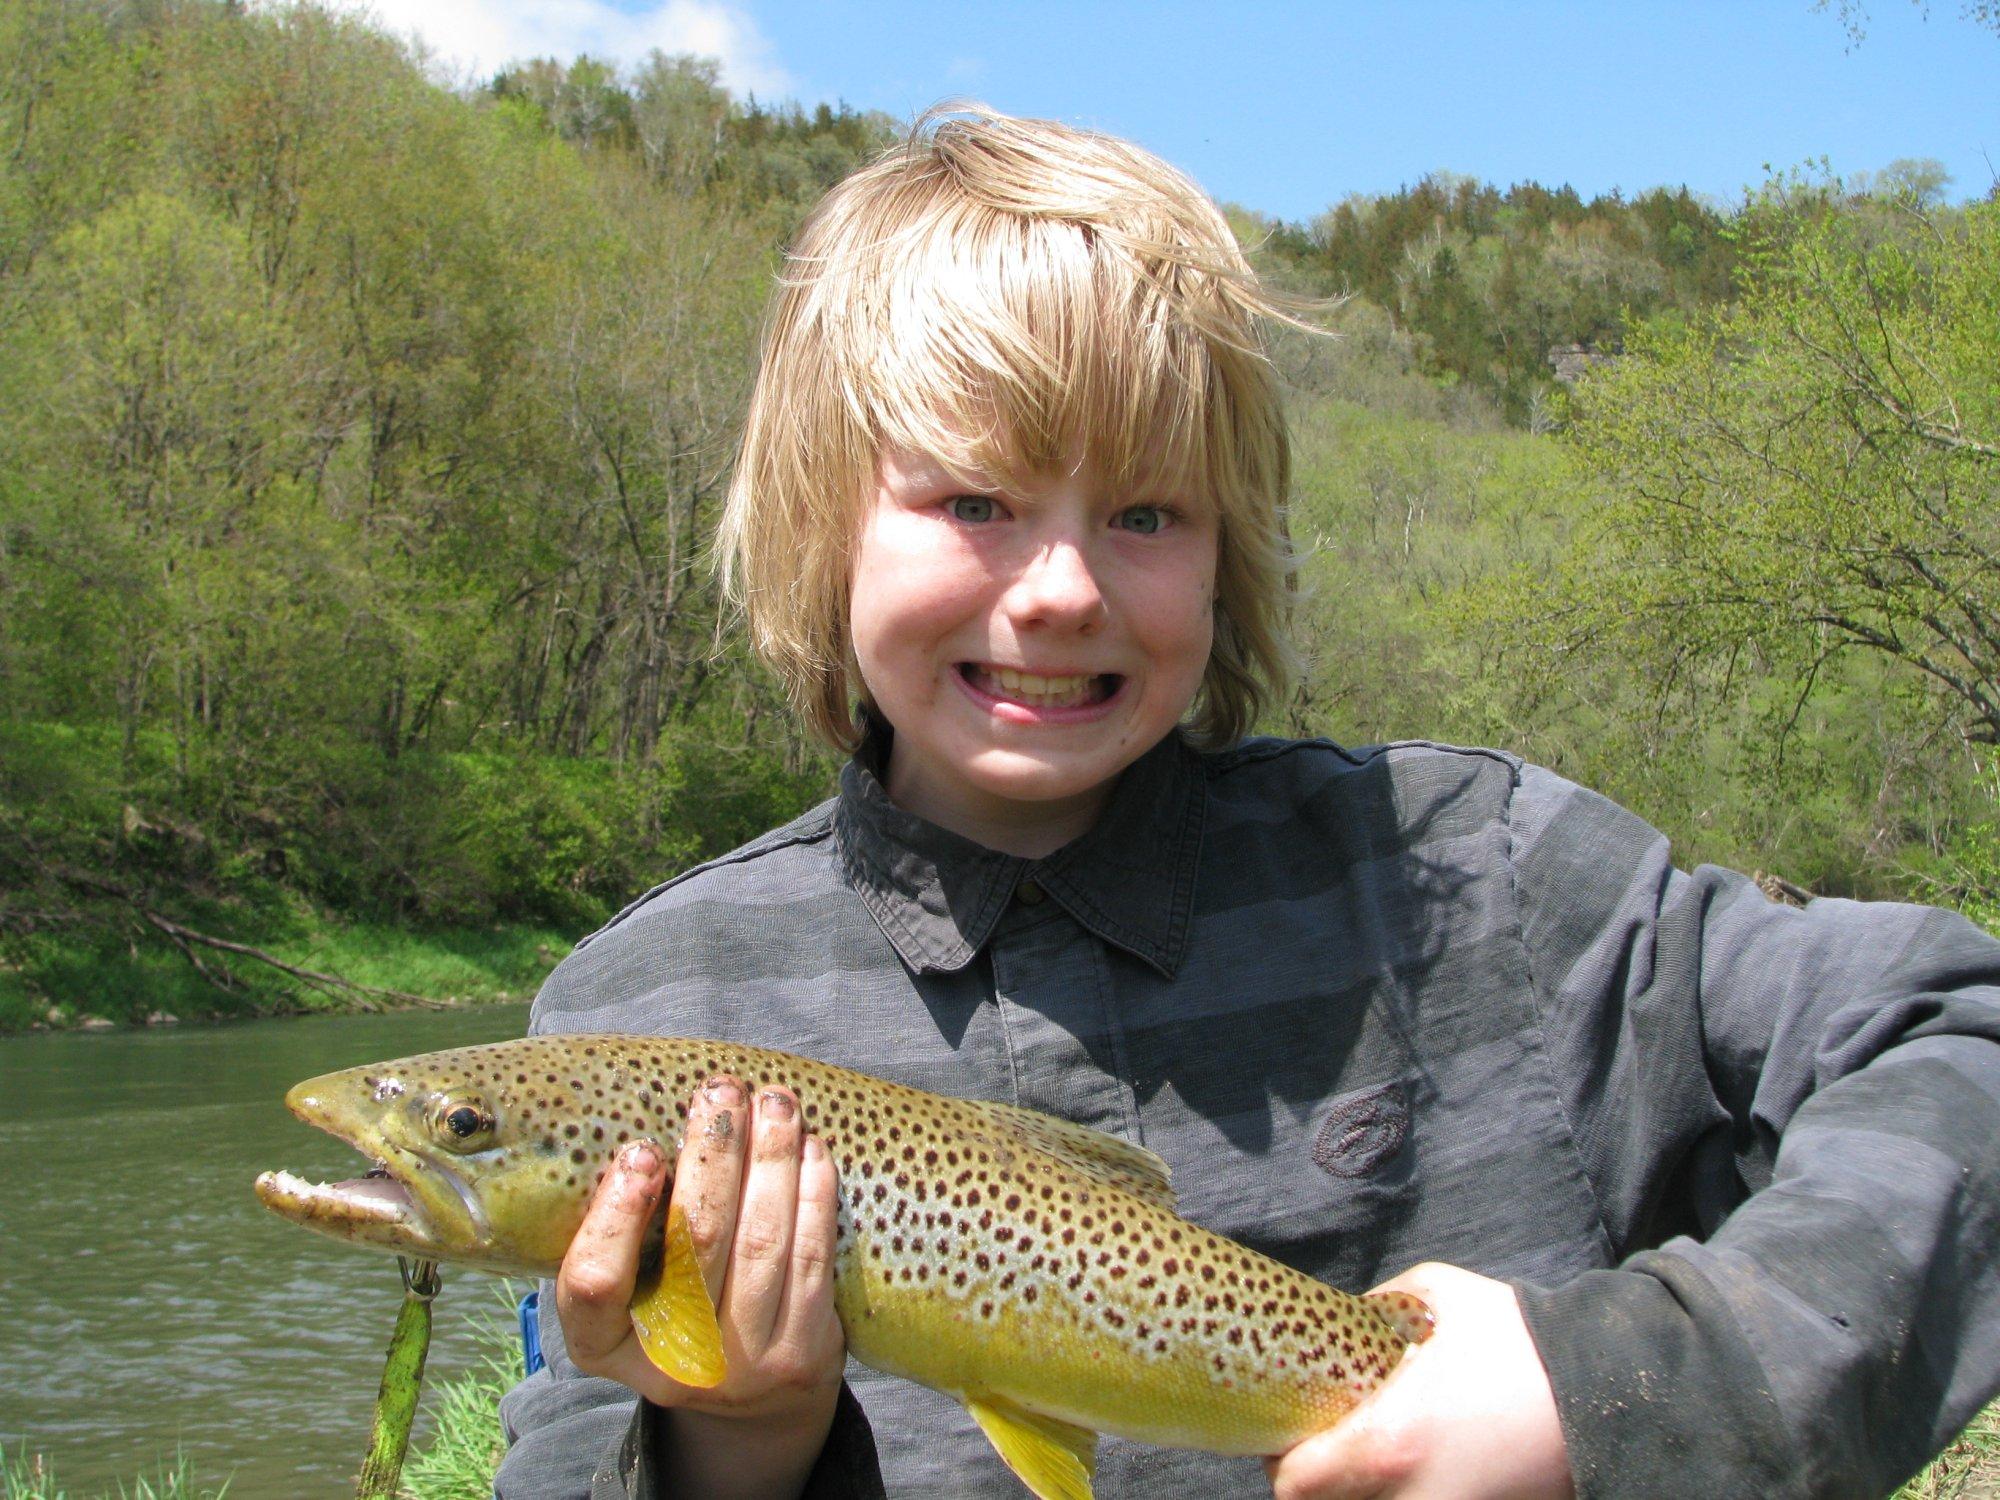 ryans 18 inch brown trout_1.jpg